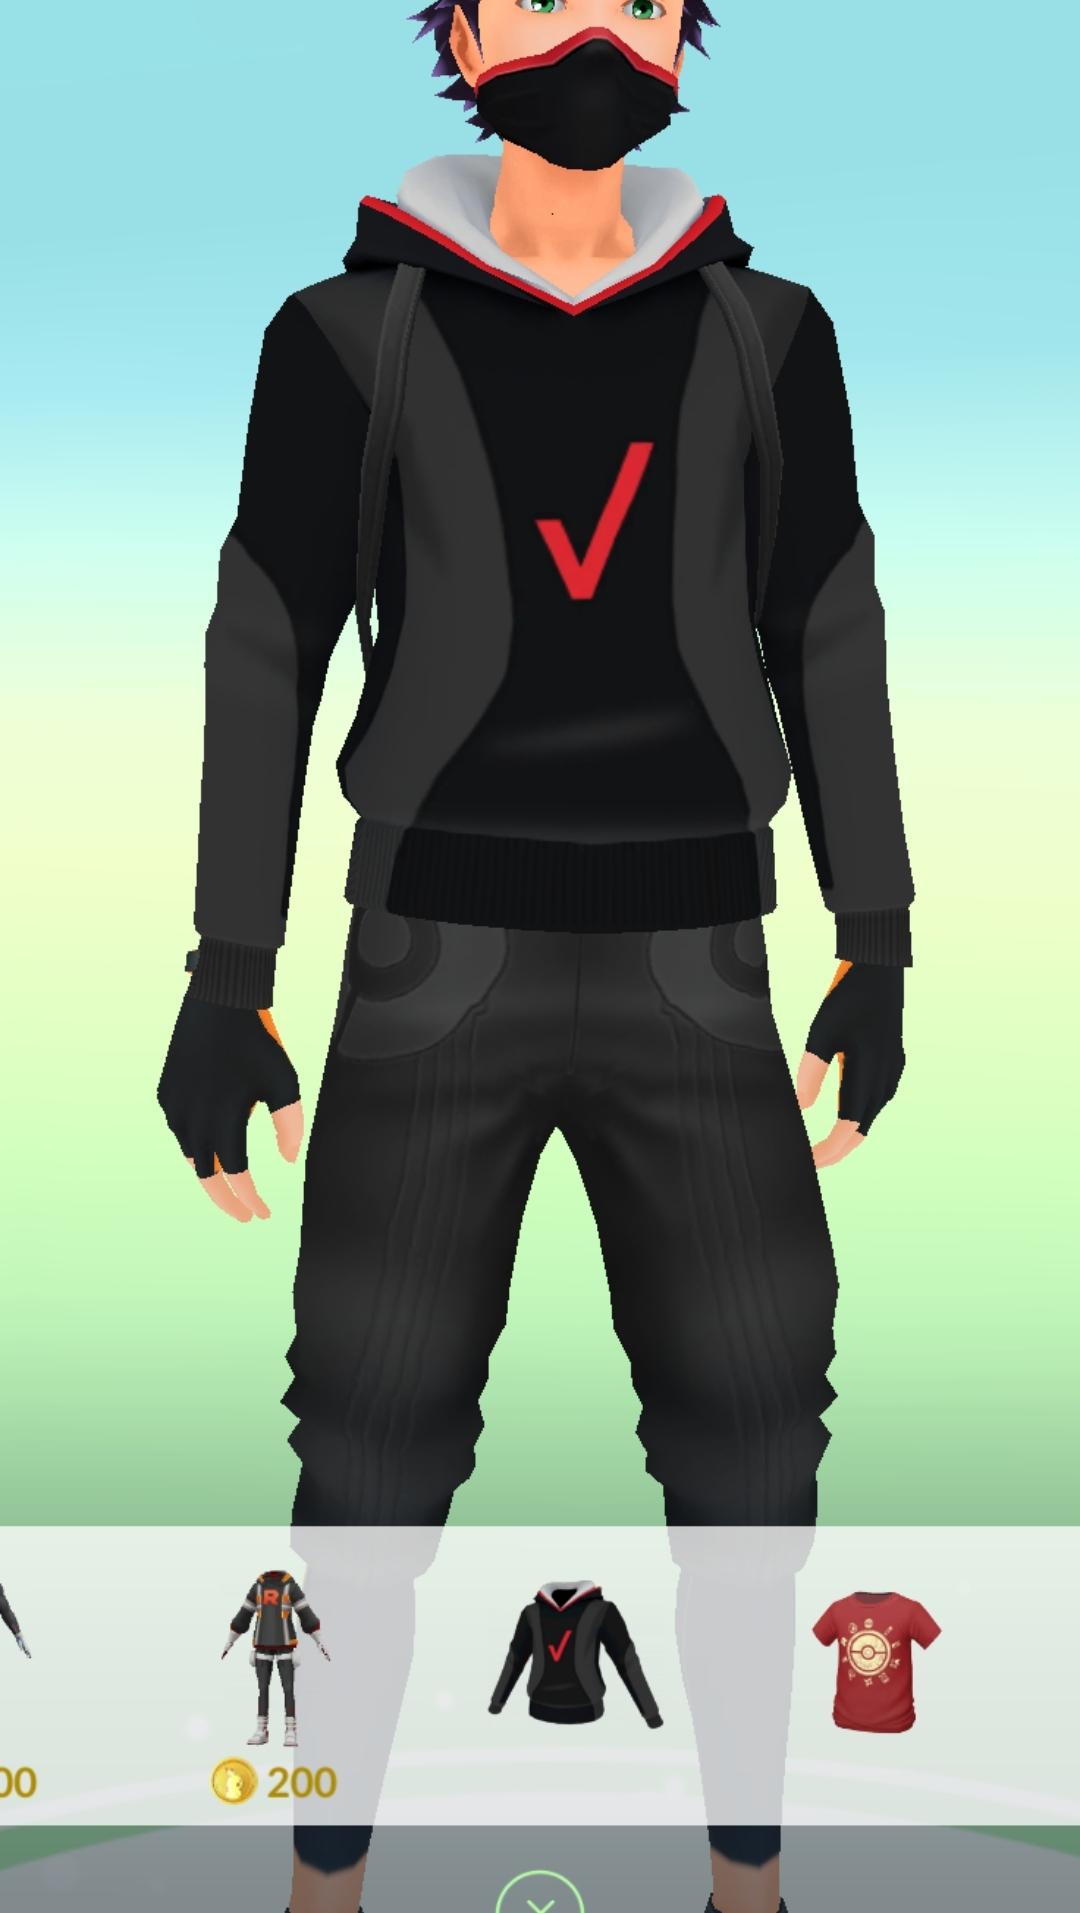 [Pokemon Go] gratis setje Verizon kleren + ballen